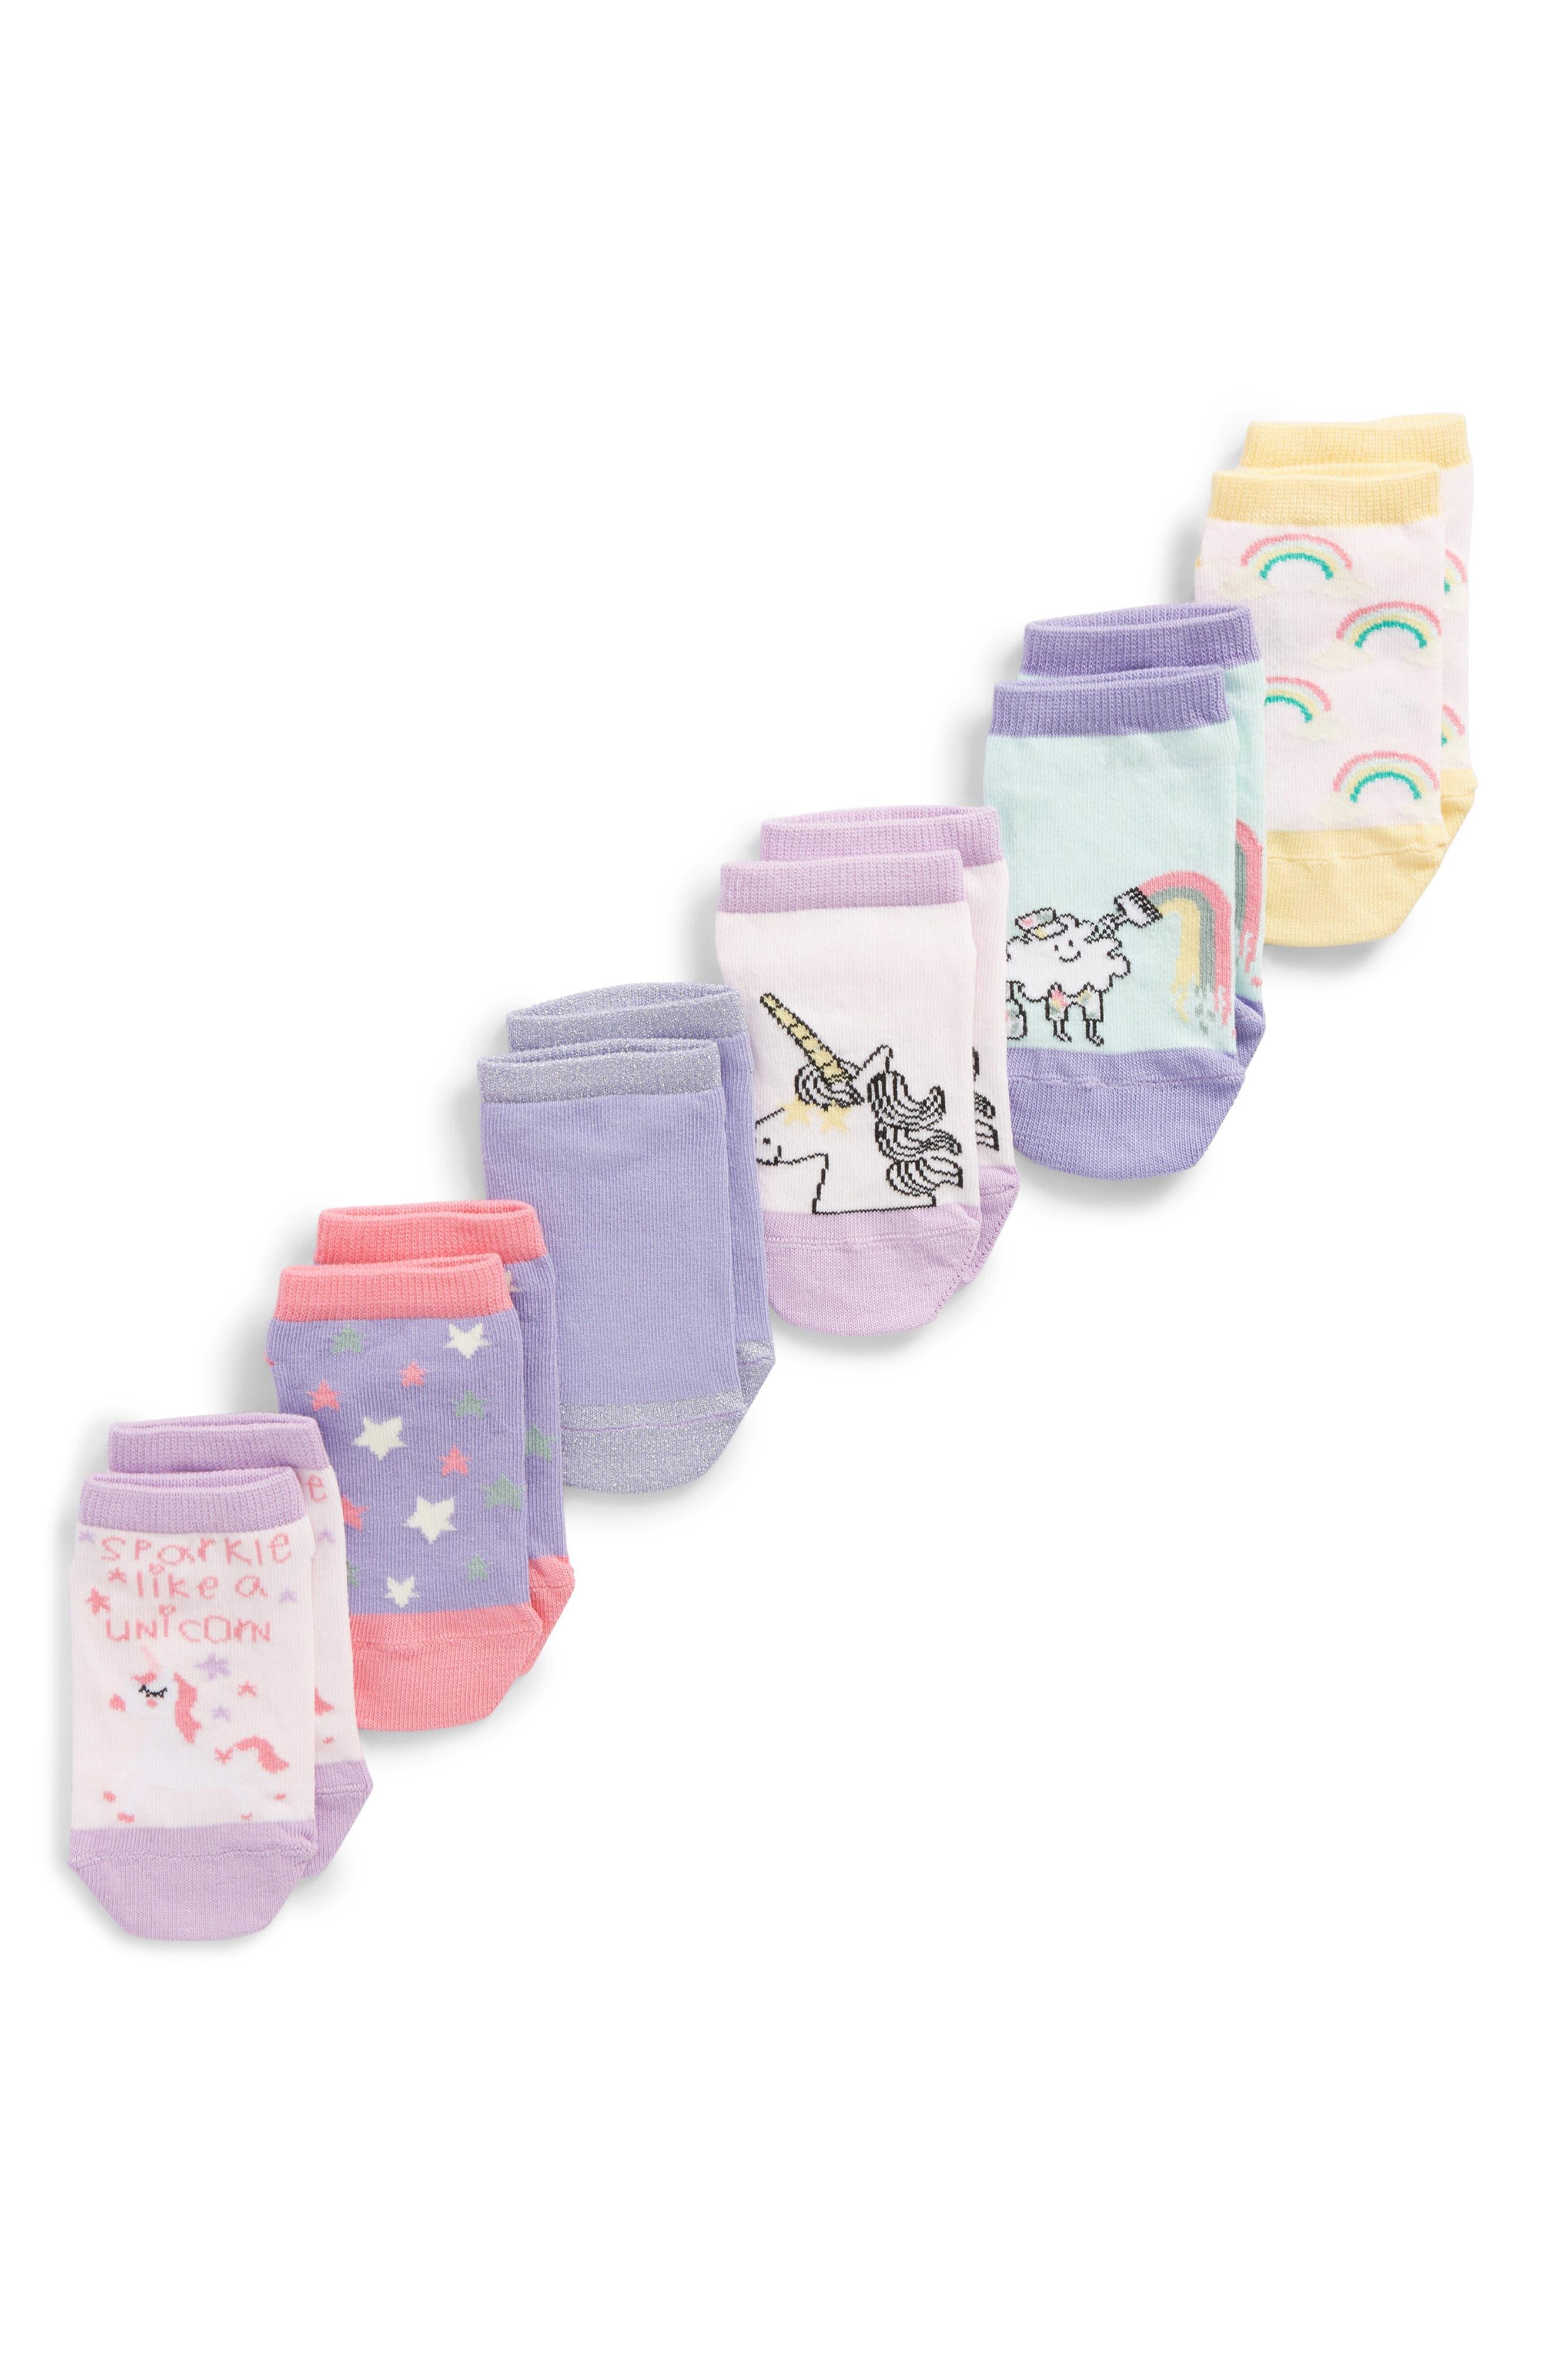 6-Pack Assorted Low Cut Socks,                             Main thumbnail 1, color,                             Grey/Purple Multi